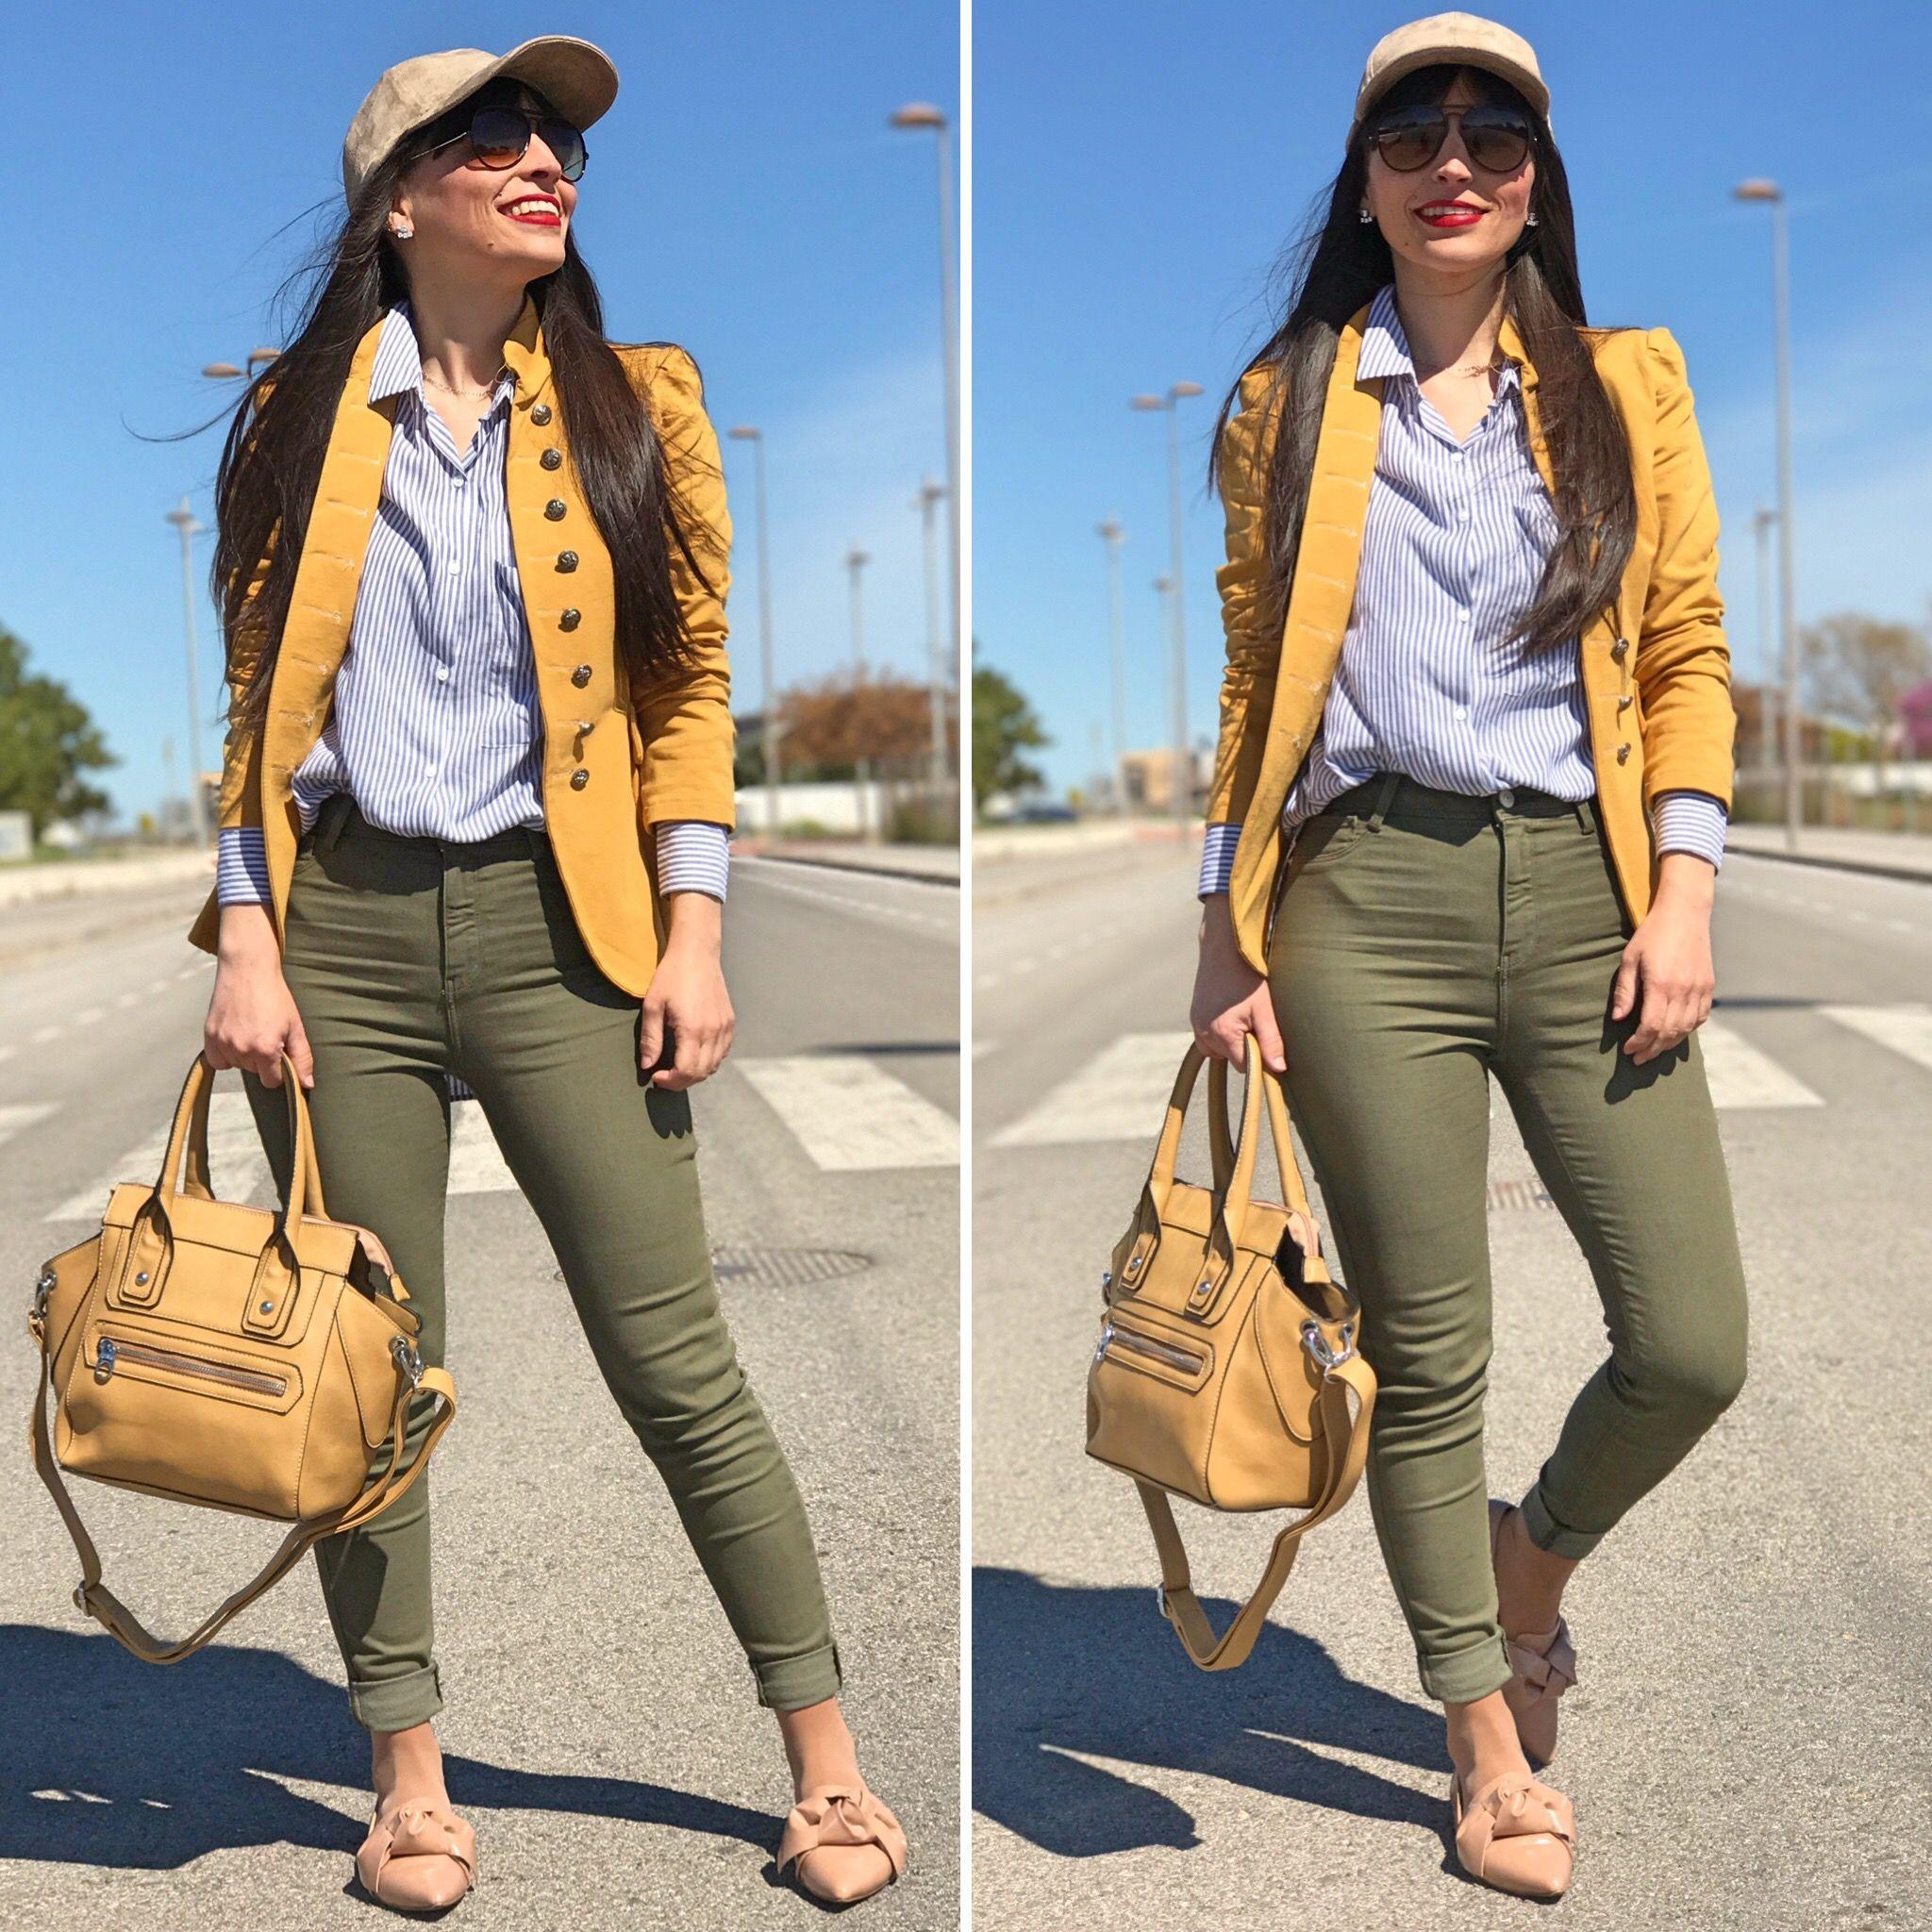 osma brand - Temporada: Primavera-Verano - Tags: look, ootd, fashion ,streetstyle, lifestyle, moda - Descripción: look en tonos mostaza con nuevo bolso de osma brand #FashionOlé